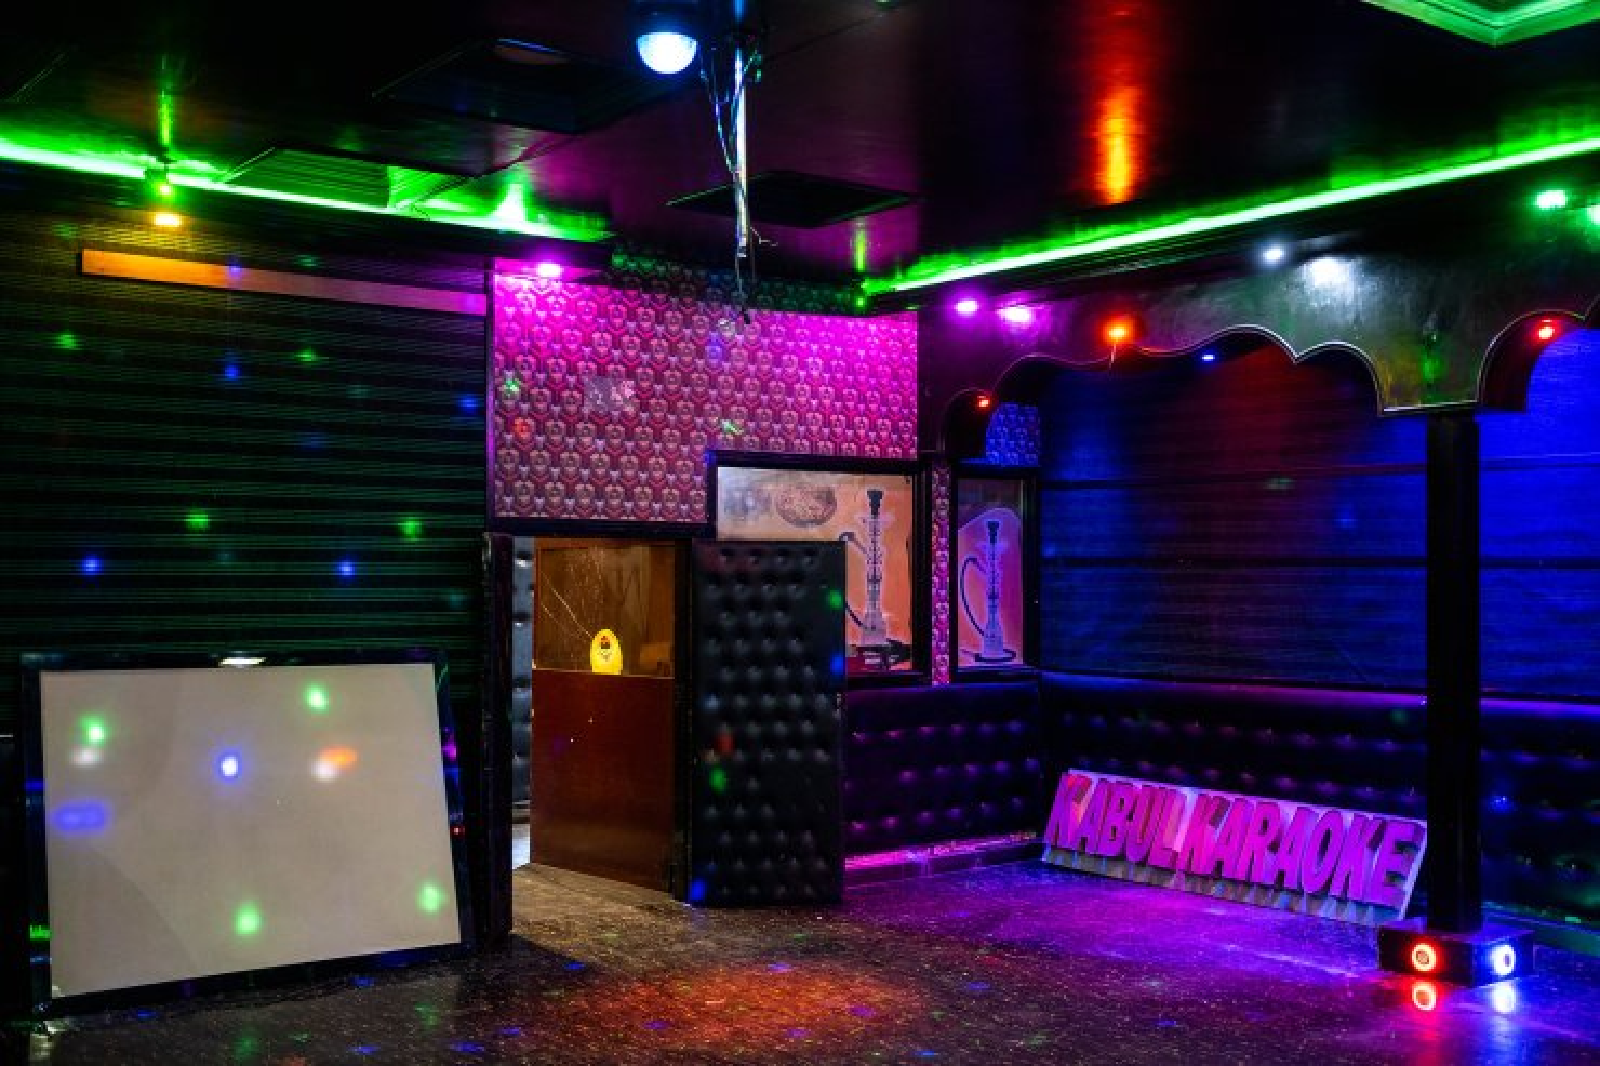 Lights shine at a no longer operative Karaoke hall in Kabul, Afghanistan, Tuesday, Sept. 21, 2021. AP